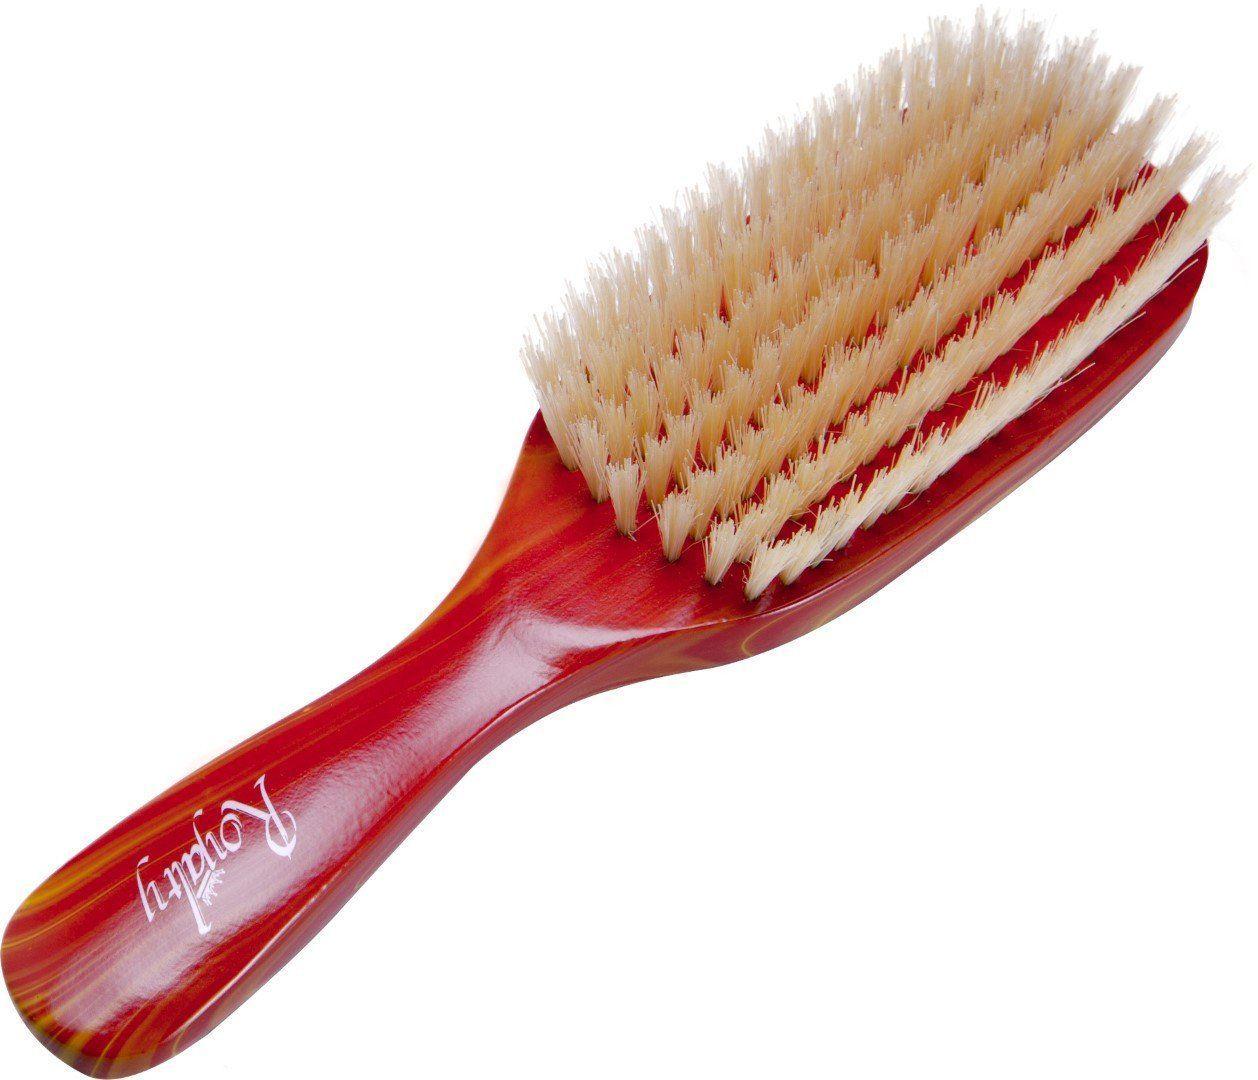 Royalty By Brush King Dcclxxx 780 Soft Wave Brush Better Than The Diane Og 8169 Wave Brush Soft Waves 360 Wave Brush